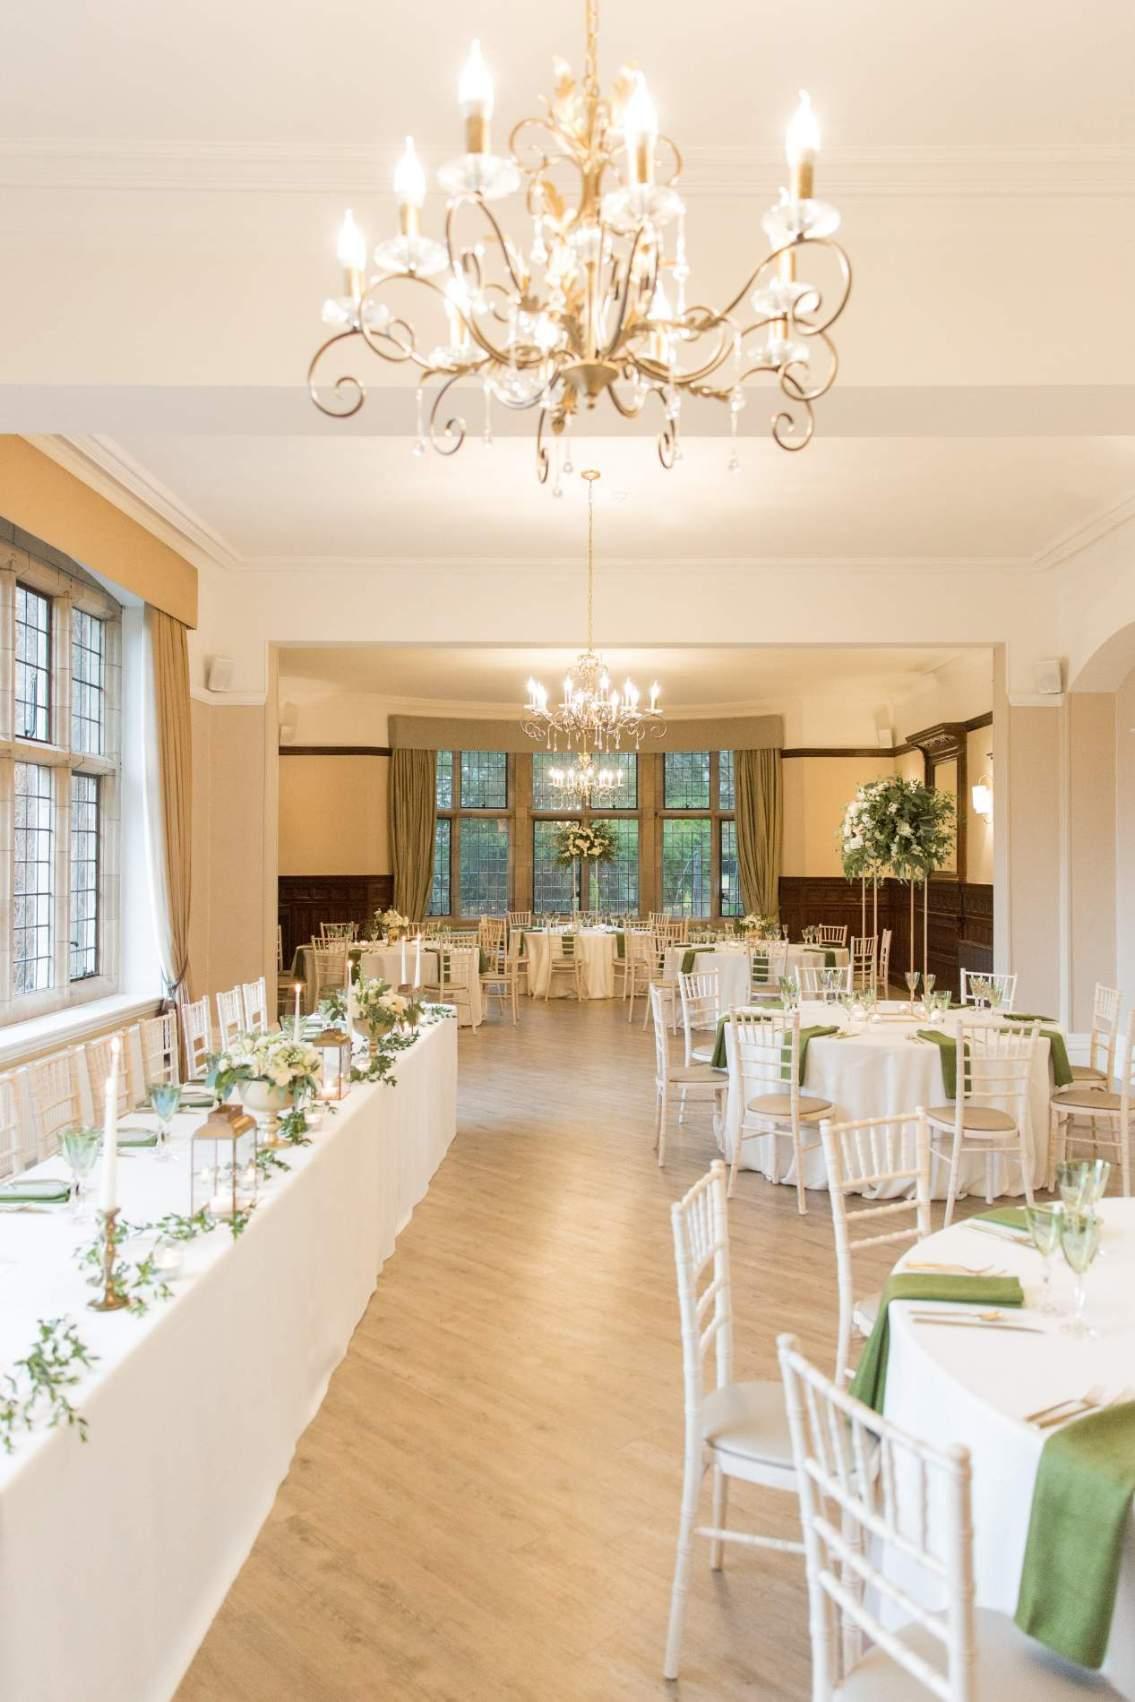 Moxhull-Hall-Sutton-Coldfield-Wedding-Venue-Midlands-0013